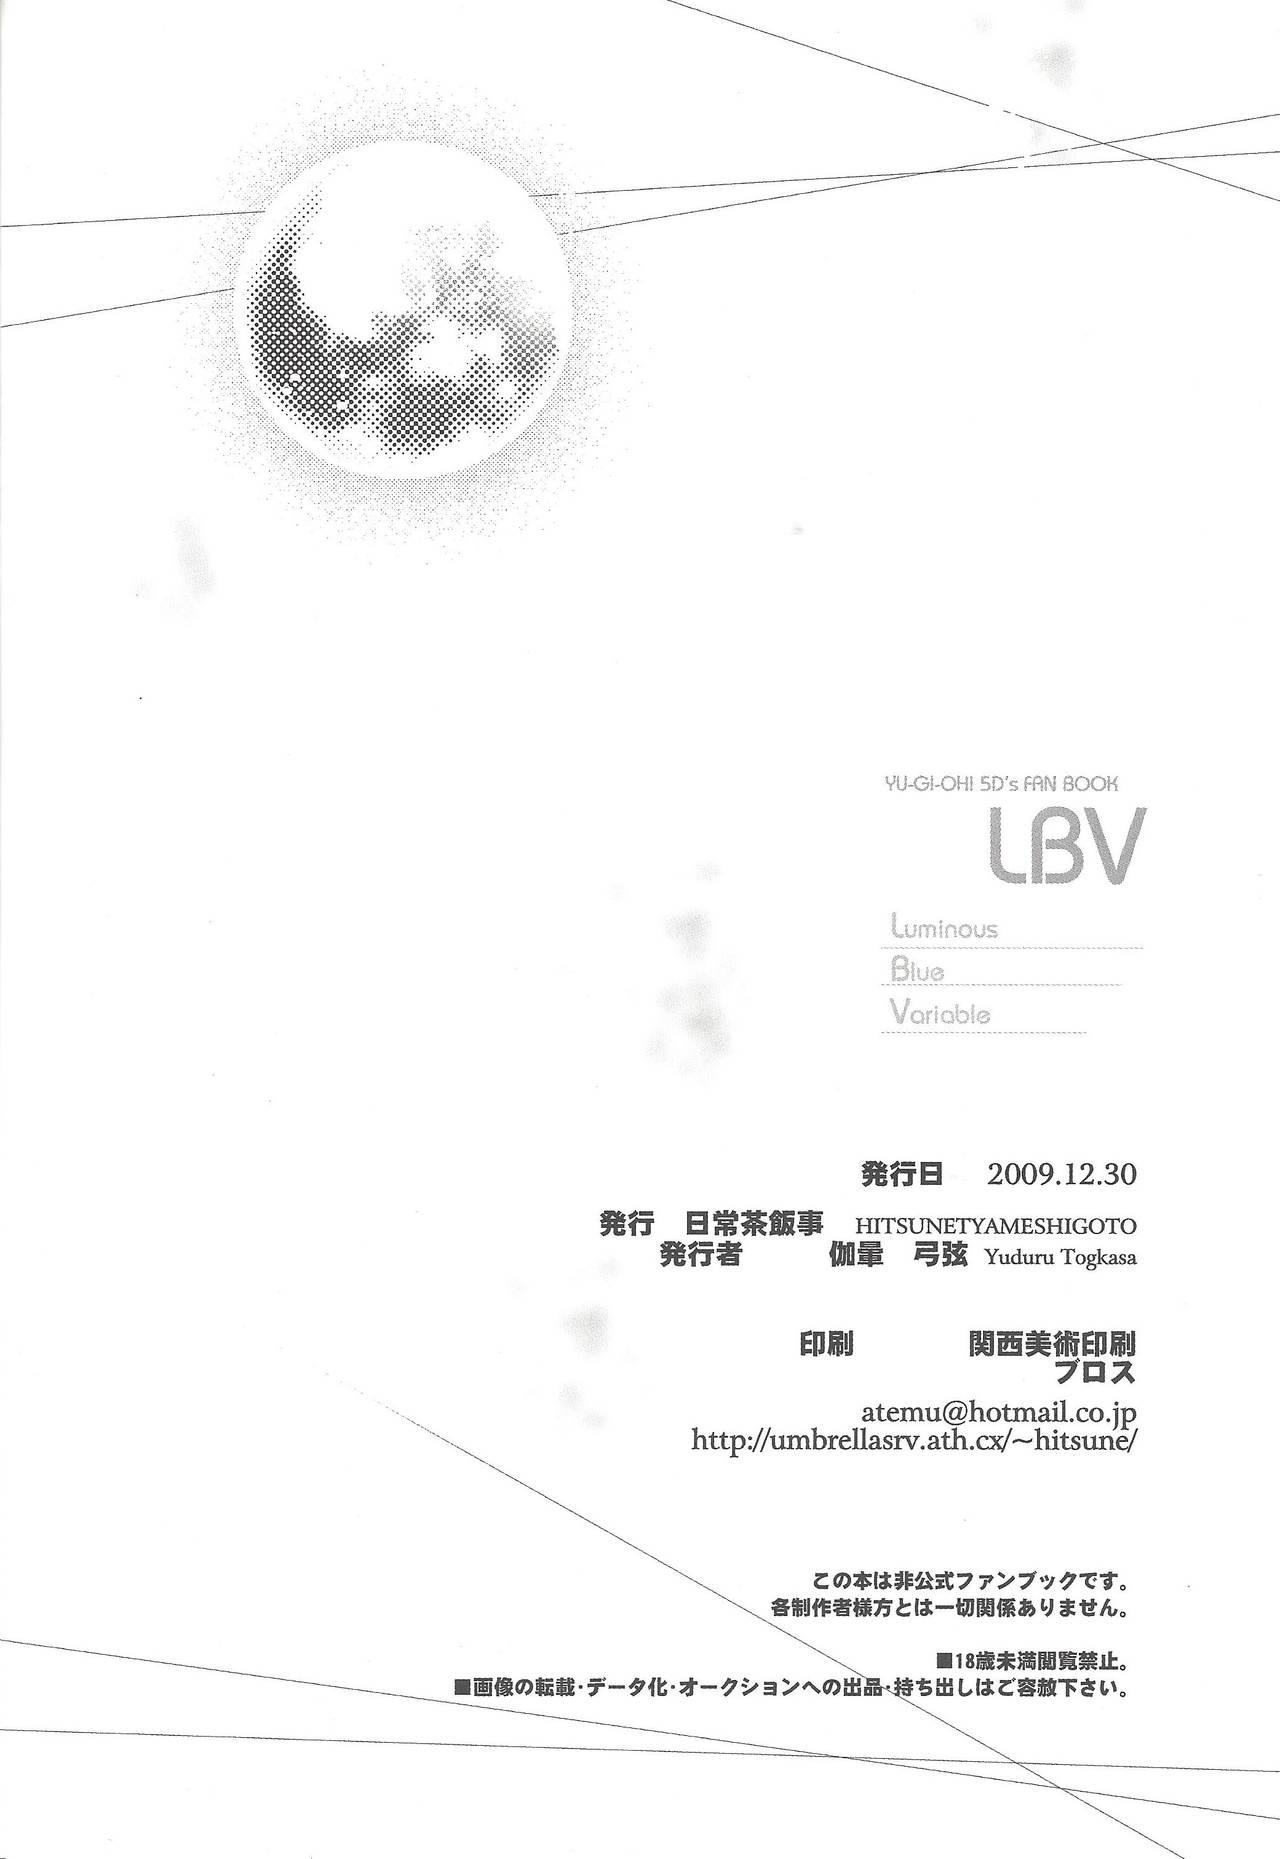 LBV - Luminous Blue Variable 36